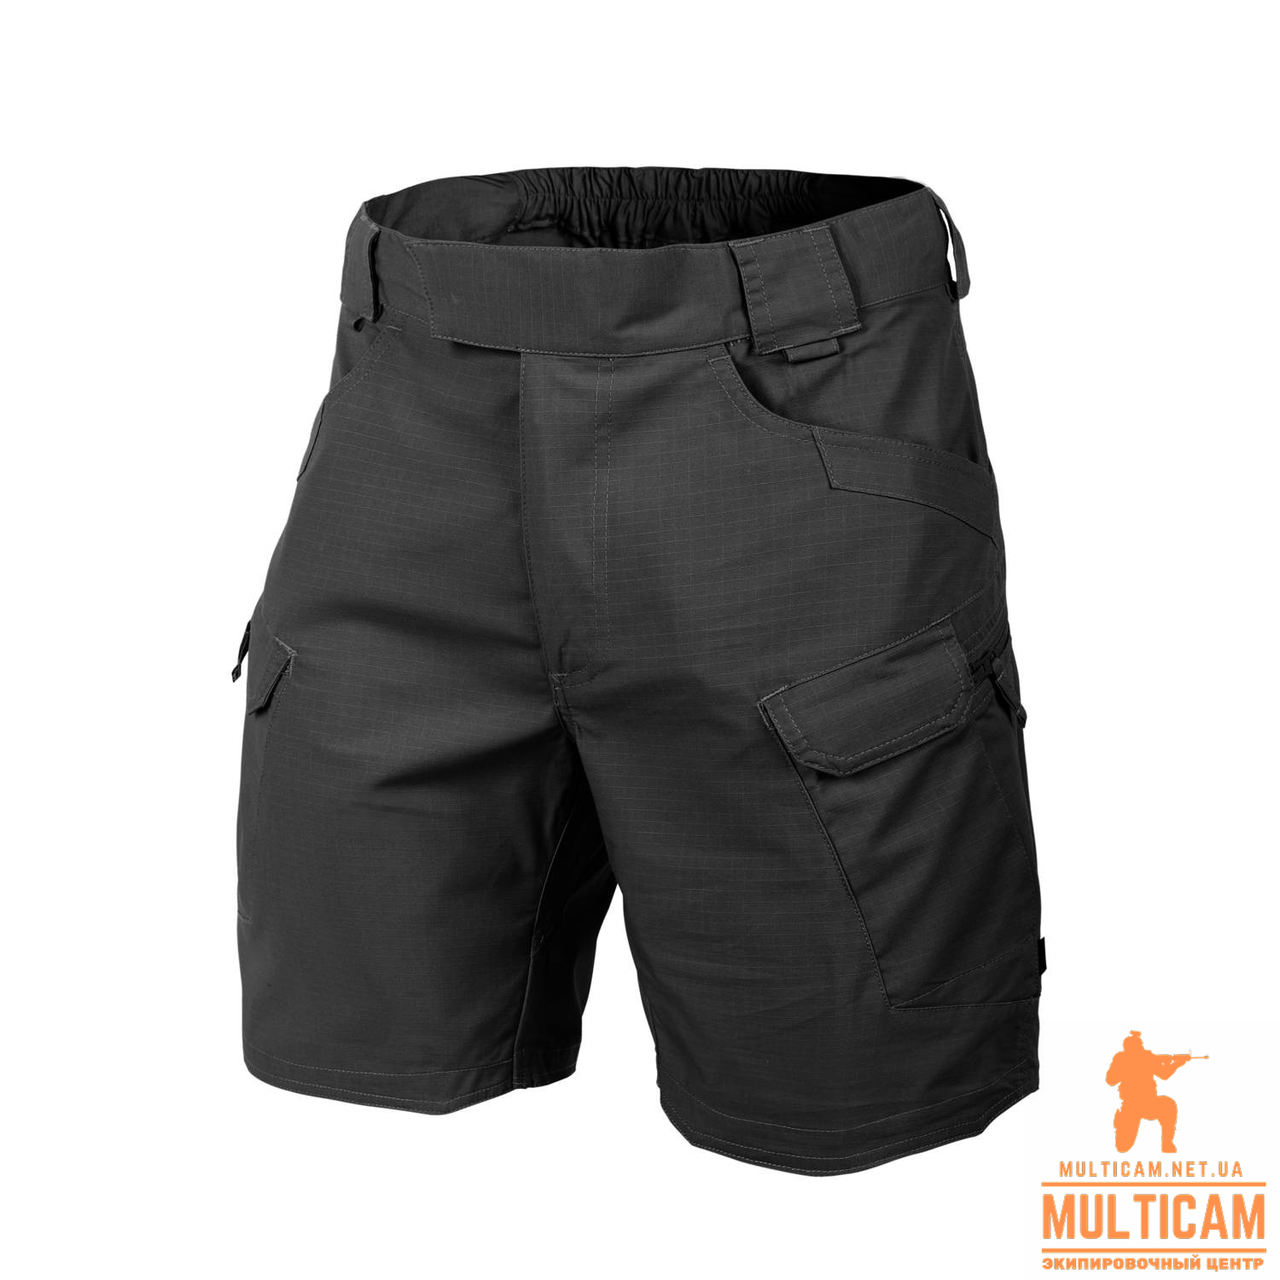 "Шорты Helikon-Tex® UTS (Urban Shorts®) 8.5""® - PolyCotton Ripstop - Черные"